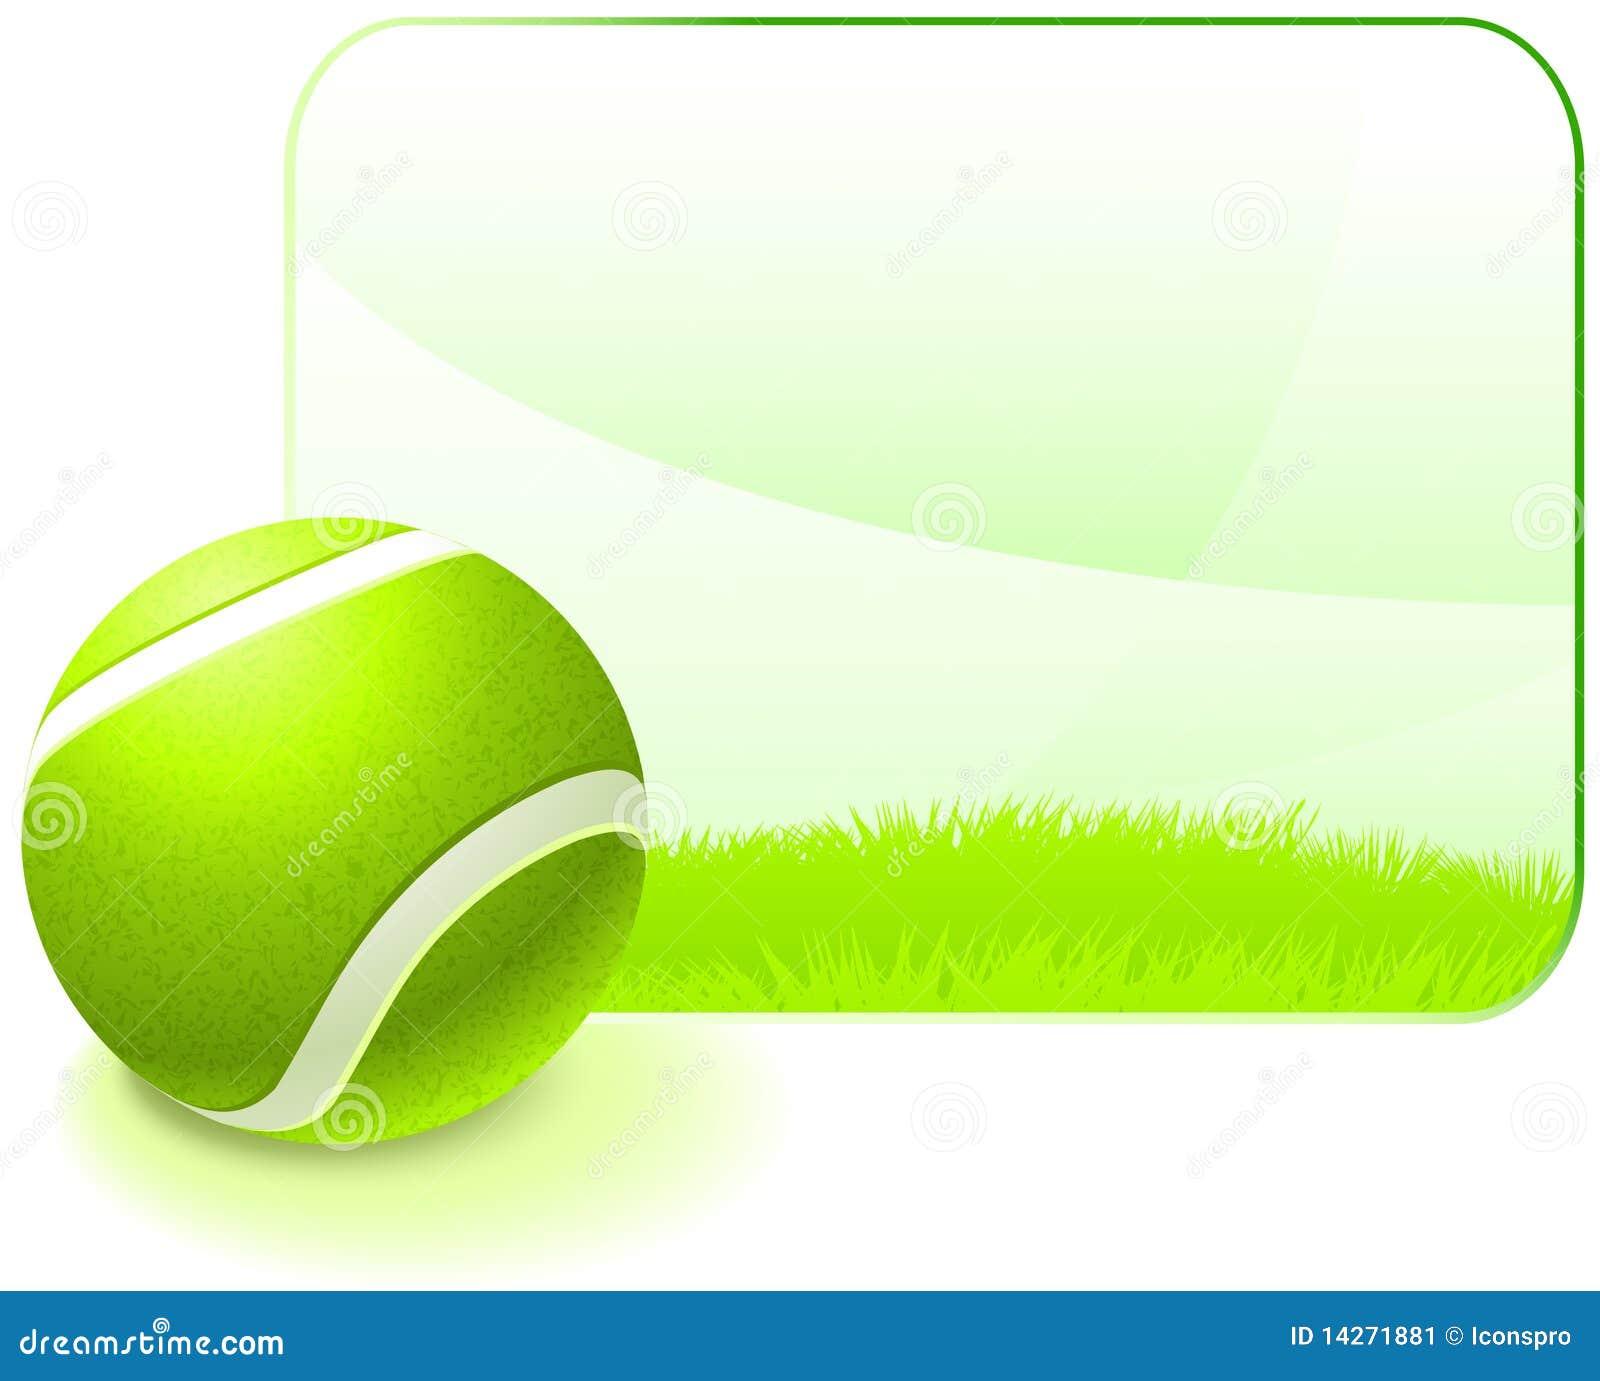 tennis balls frame easy - photo #30